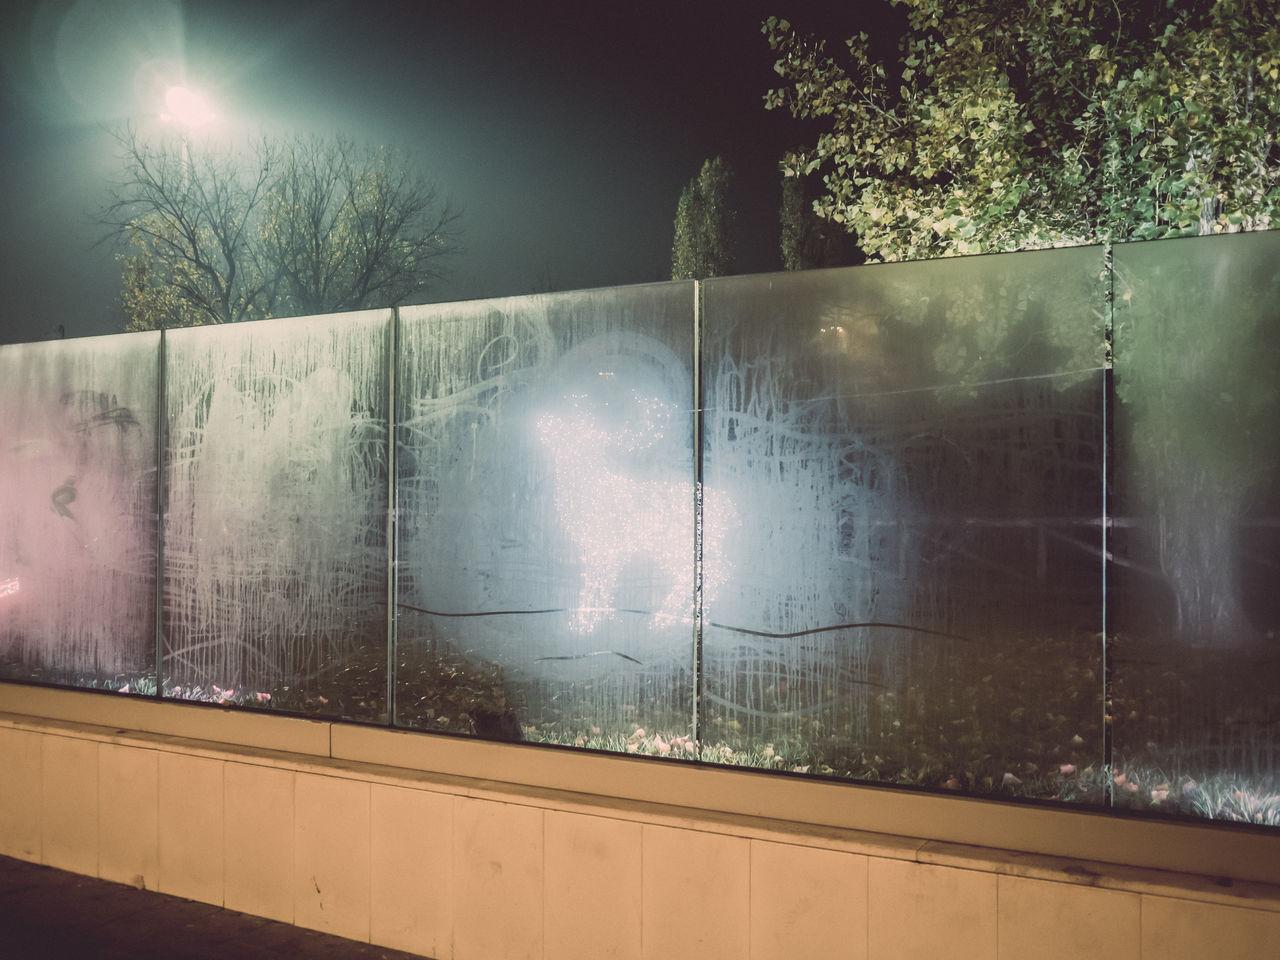 VIEW OF ILLUMINATED WINDOW IN NIGHT